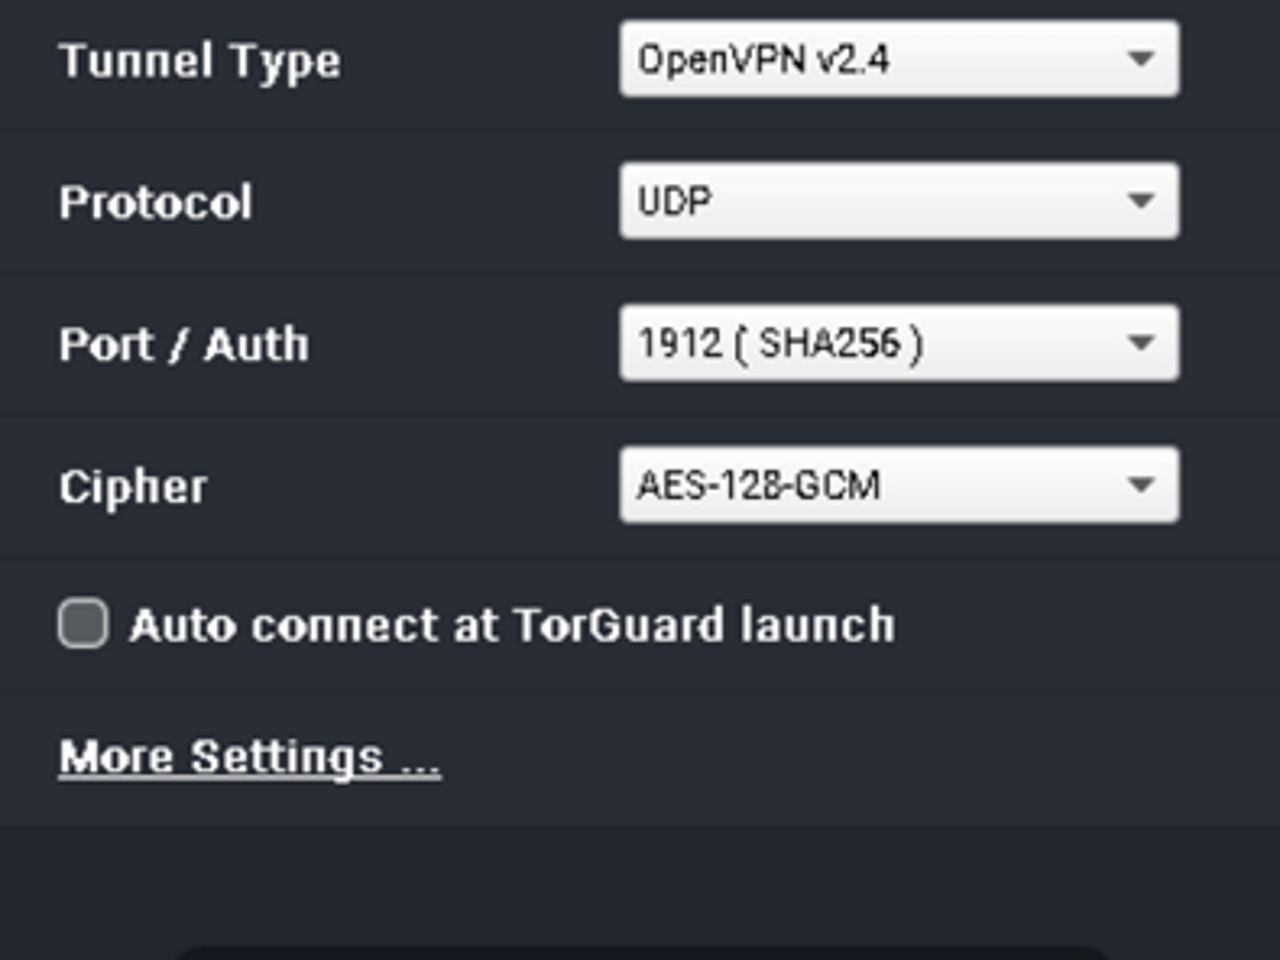 TorGuard user interface